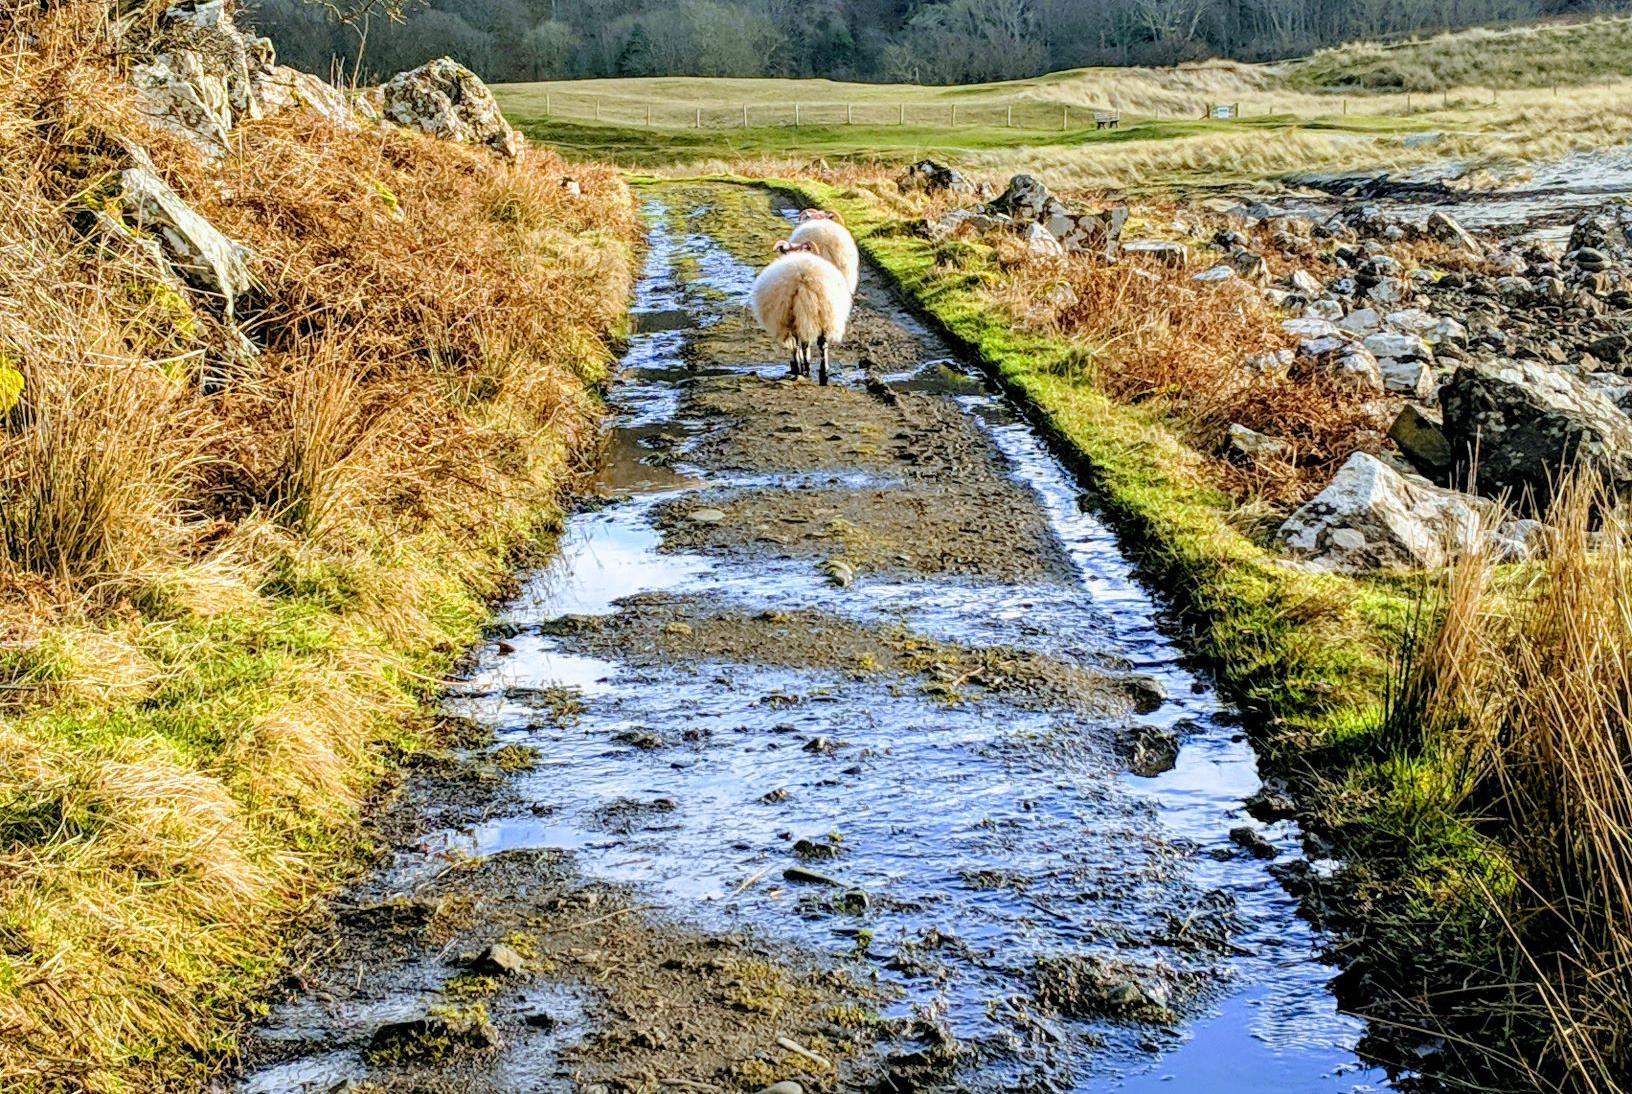 Sheep walking near Calgary Bay on the Isle of Mull, Scotland